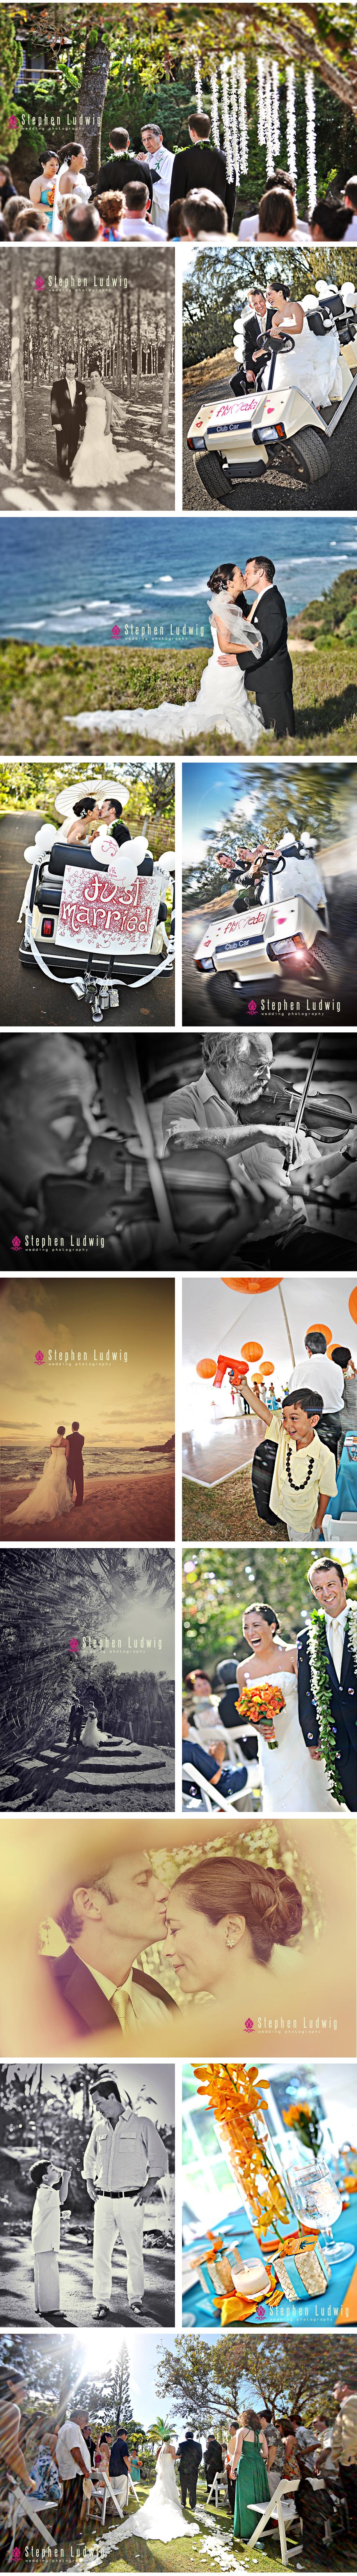 Steven-and-Kim-stephen-ludwig-photography5